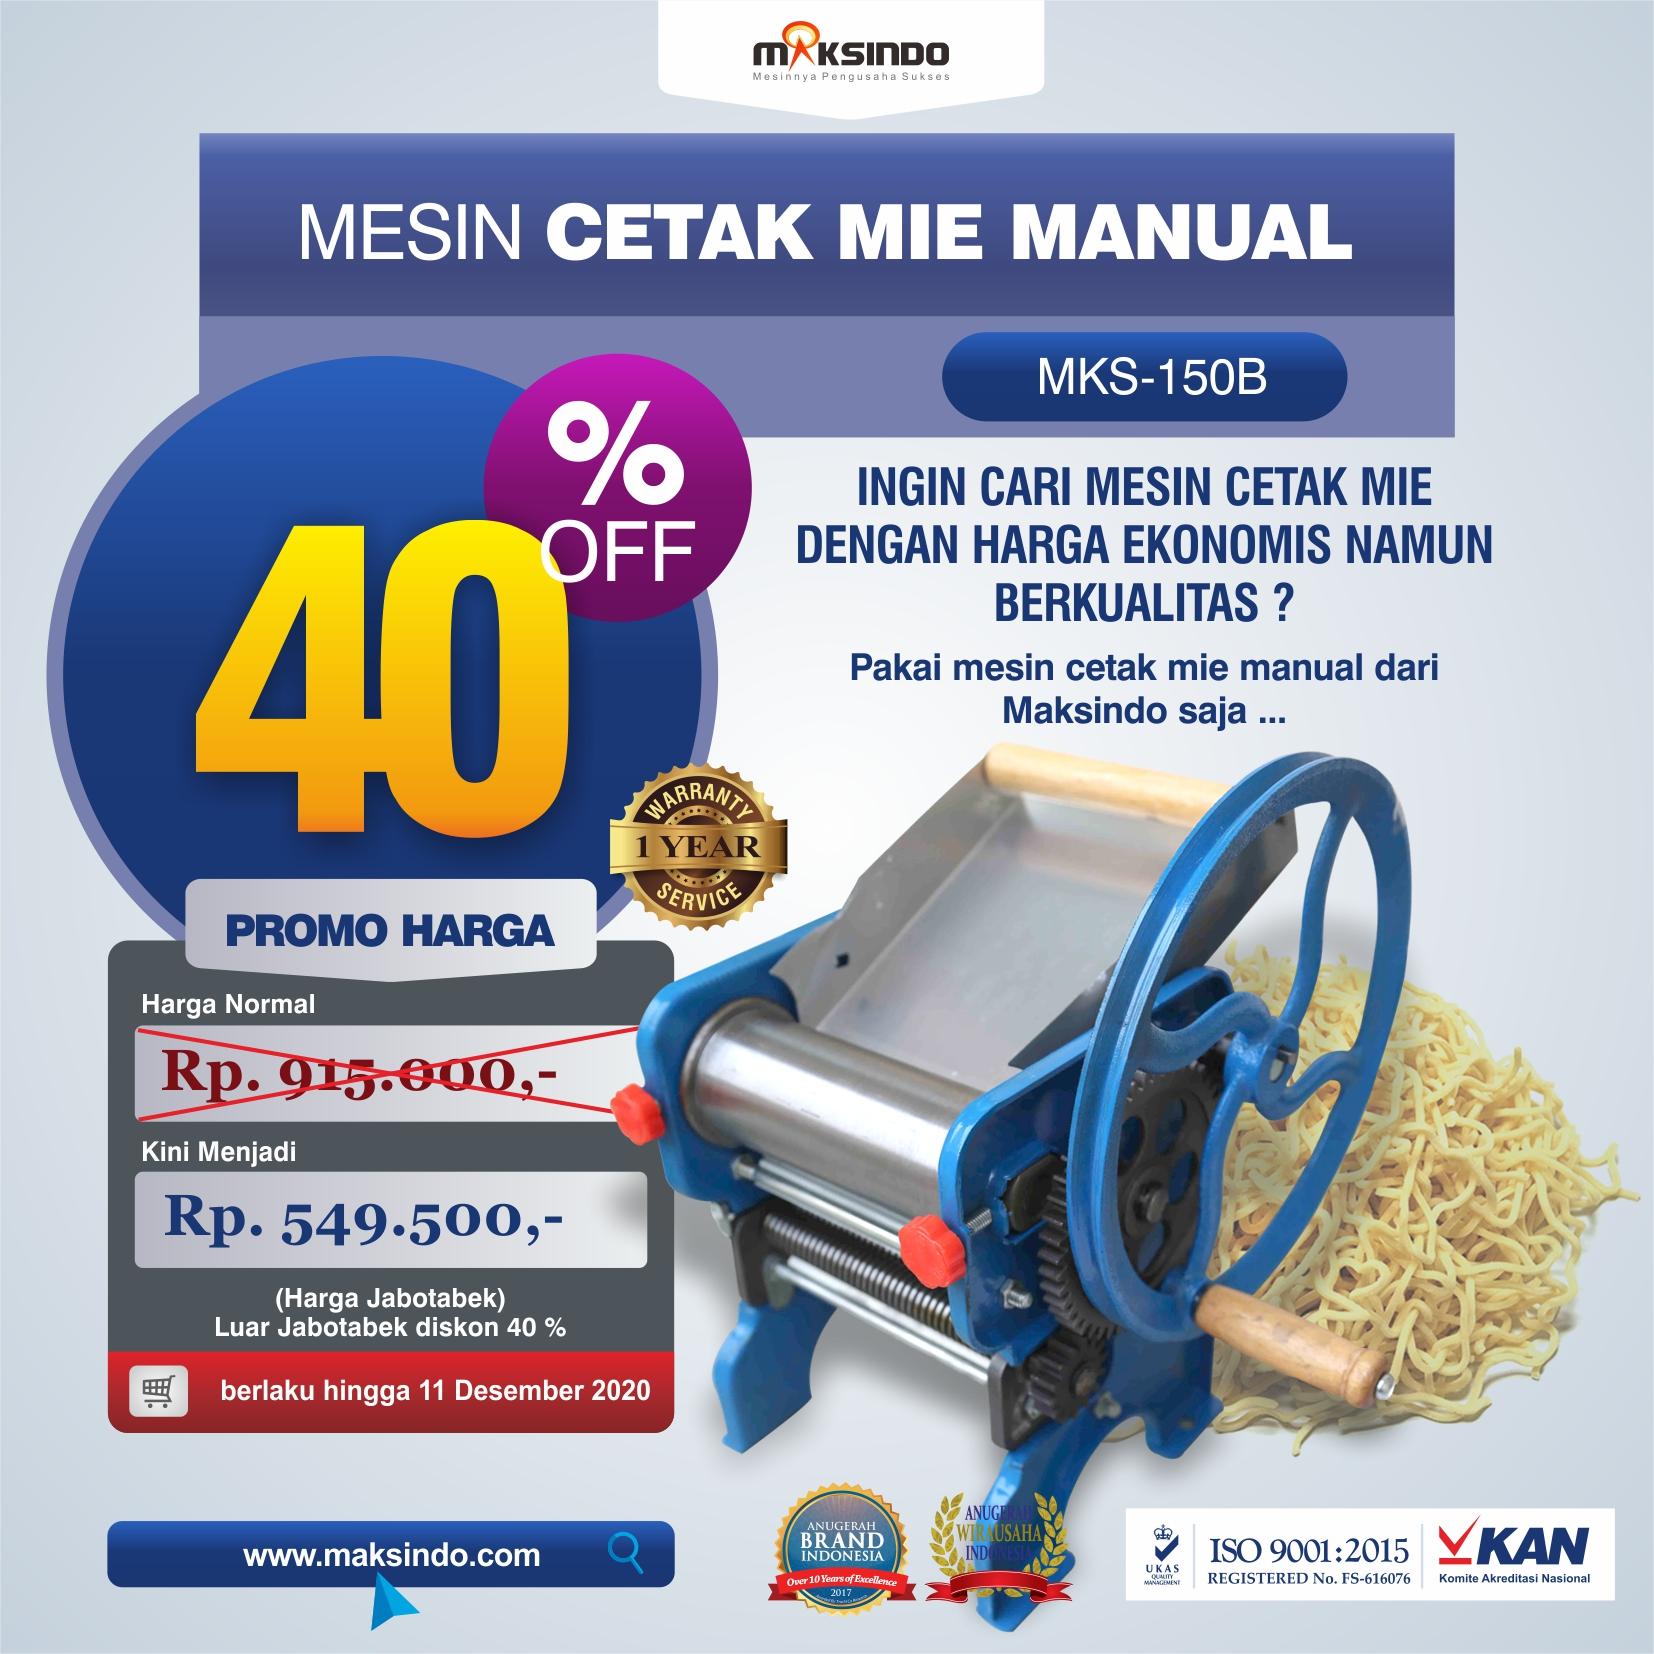 Jual Cetak Mie Manual Untuk Usaha (MKS-150B) di Semarang